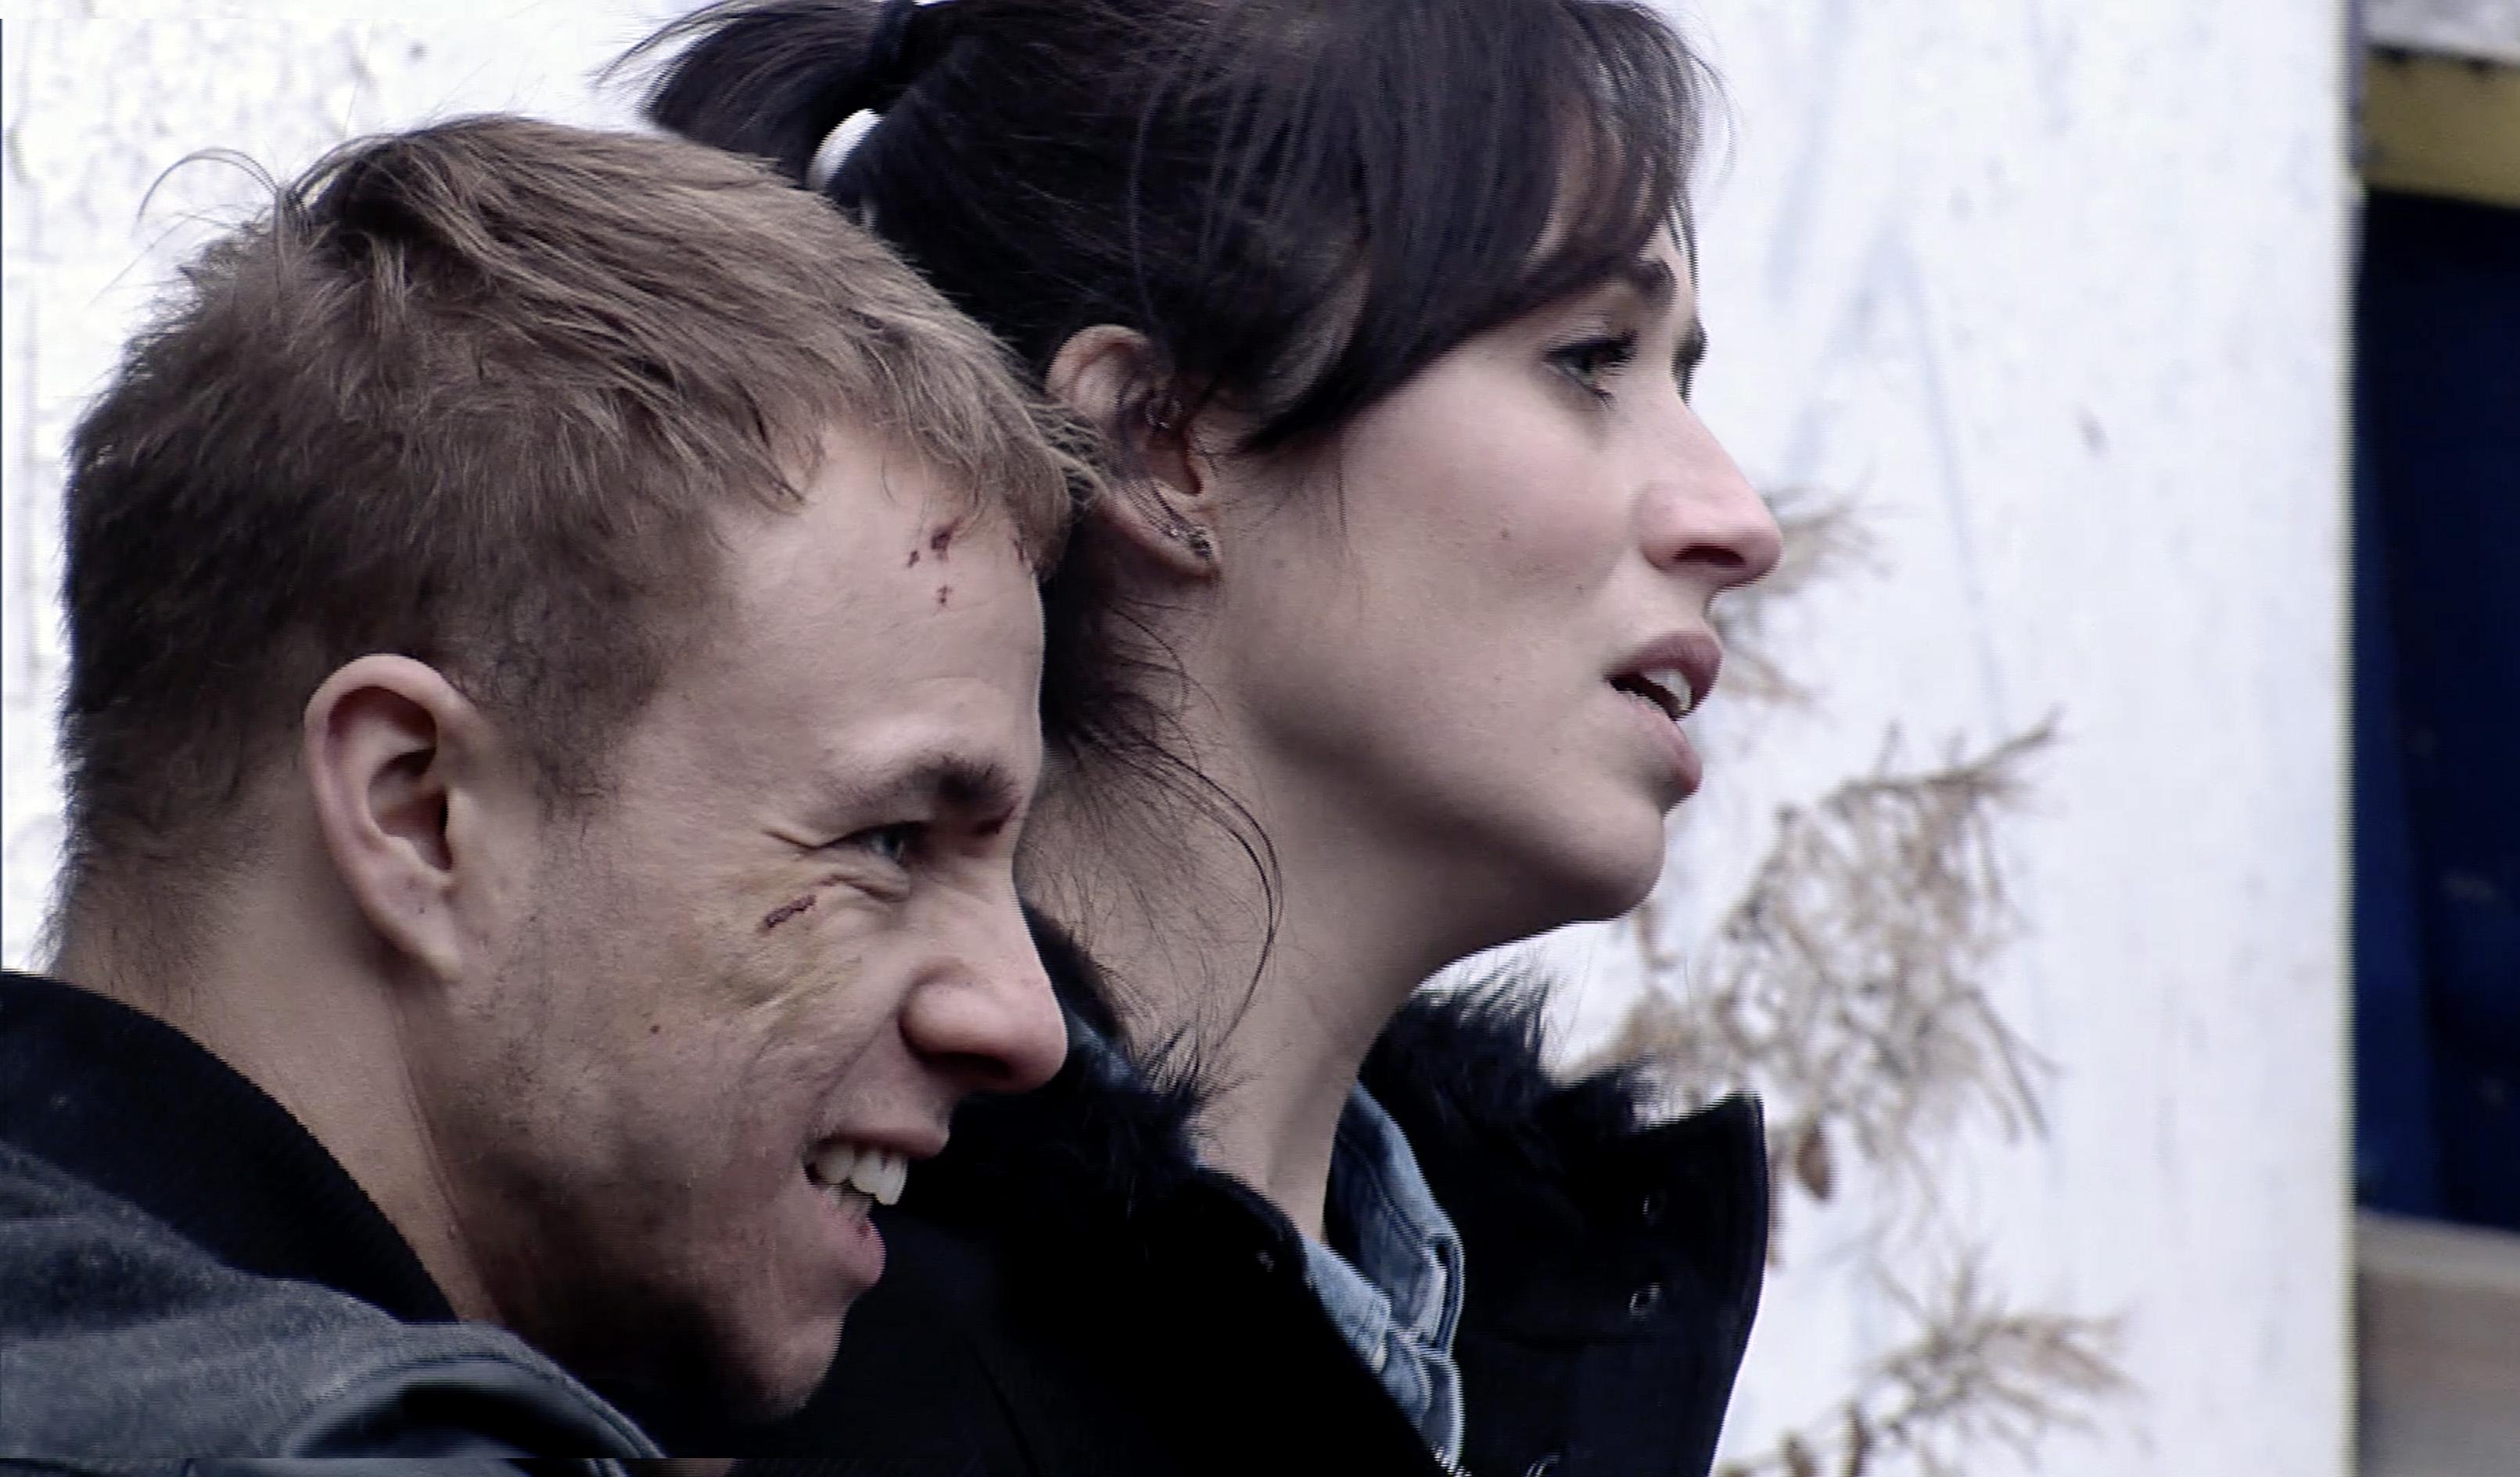 Coronation Street spoilers: Clayton Hibbs takes Shona Ramsey hostage – will she die?